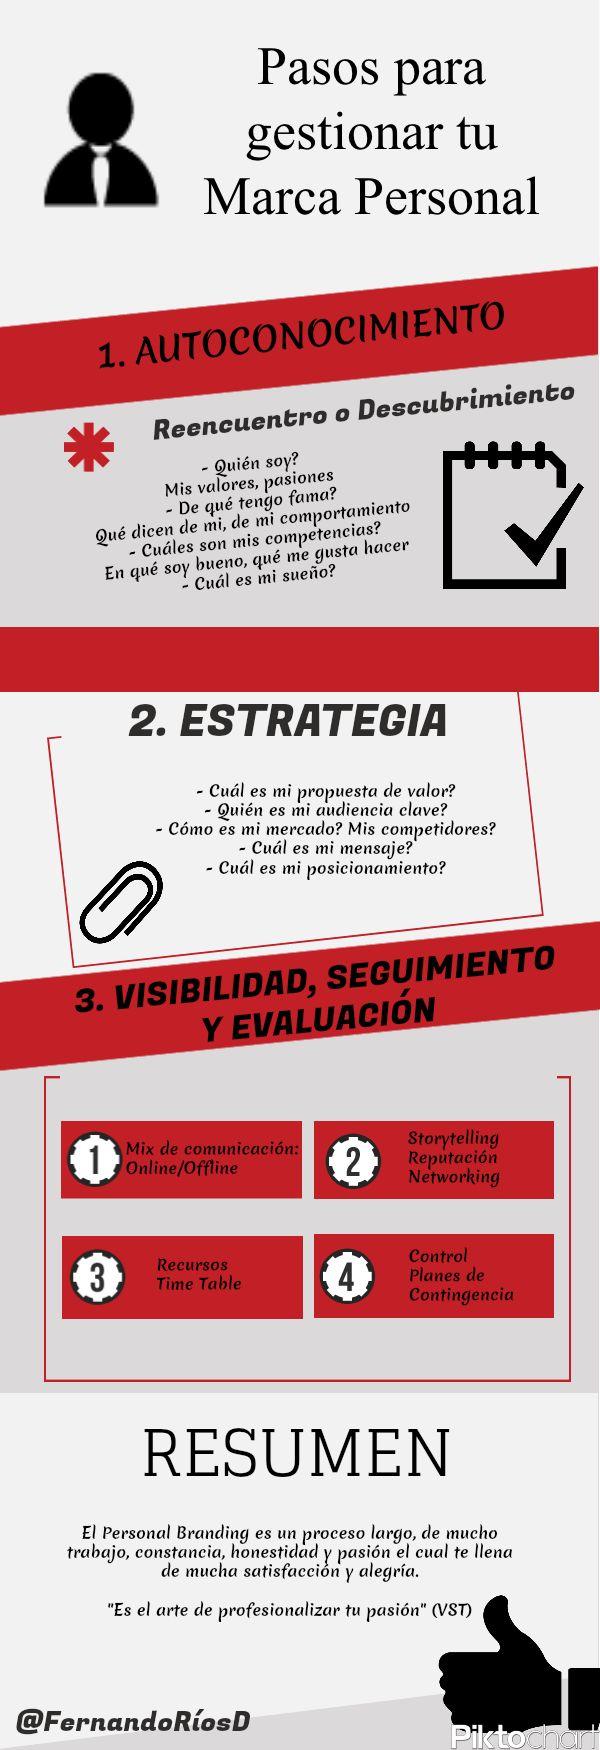 Pasos para profesionalizar tu #Branding Personal via @Fernandoríos